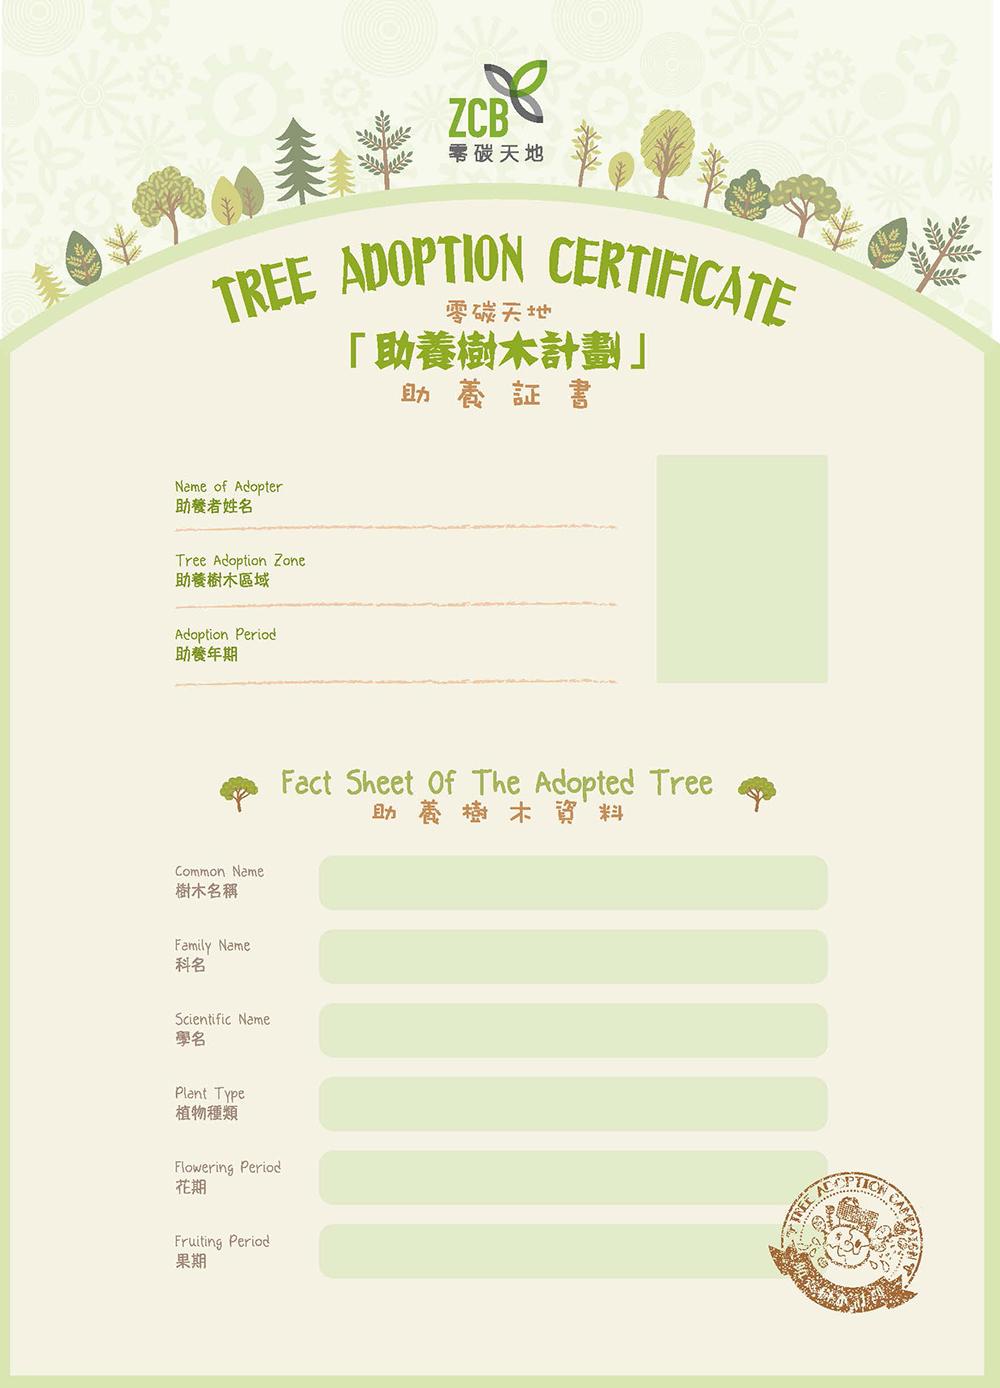 Match Communications Zcb Tree Adoption Certificate